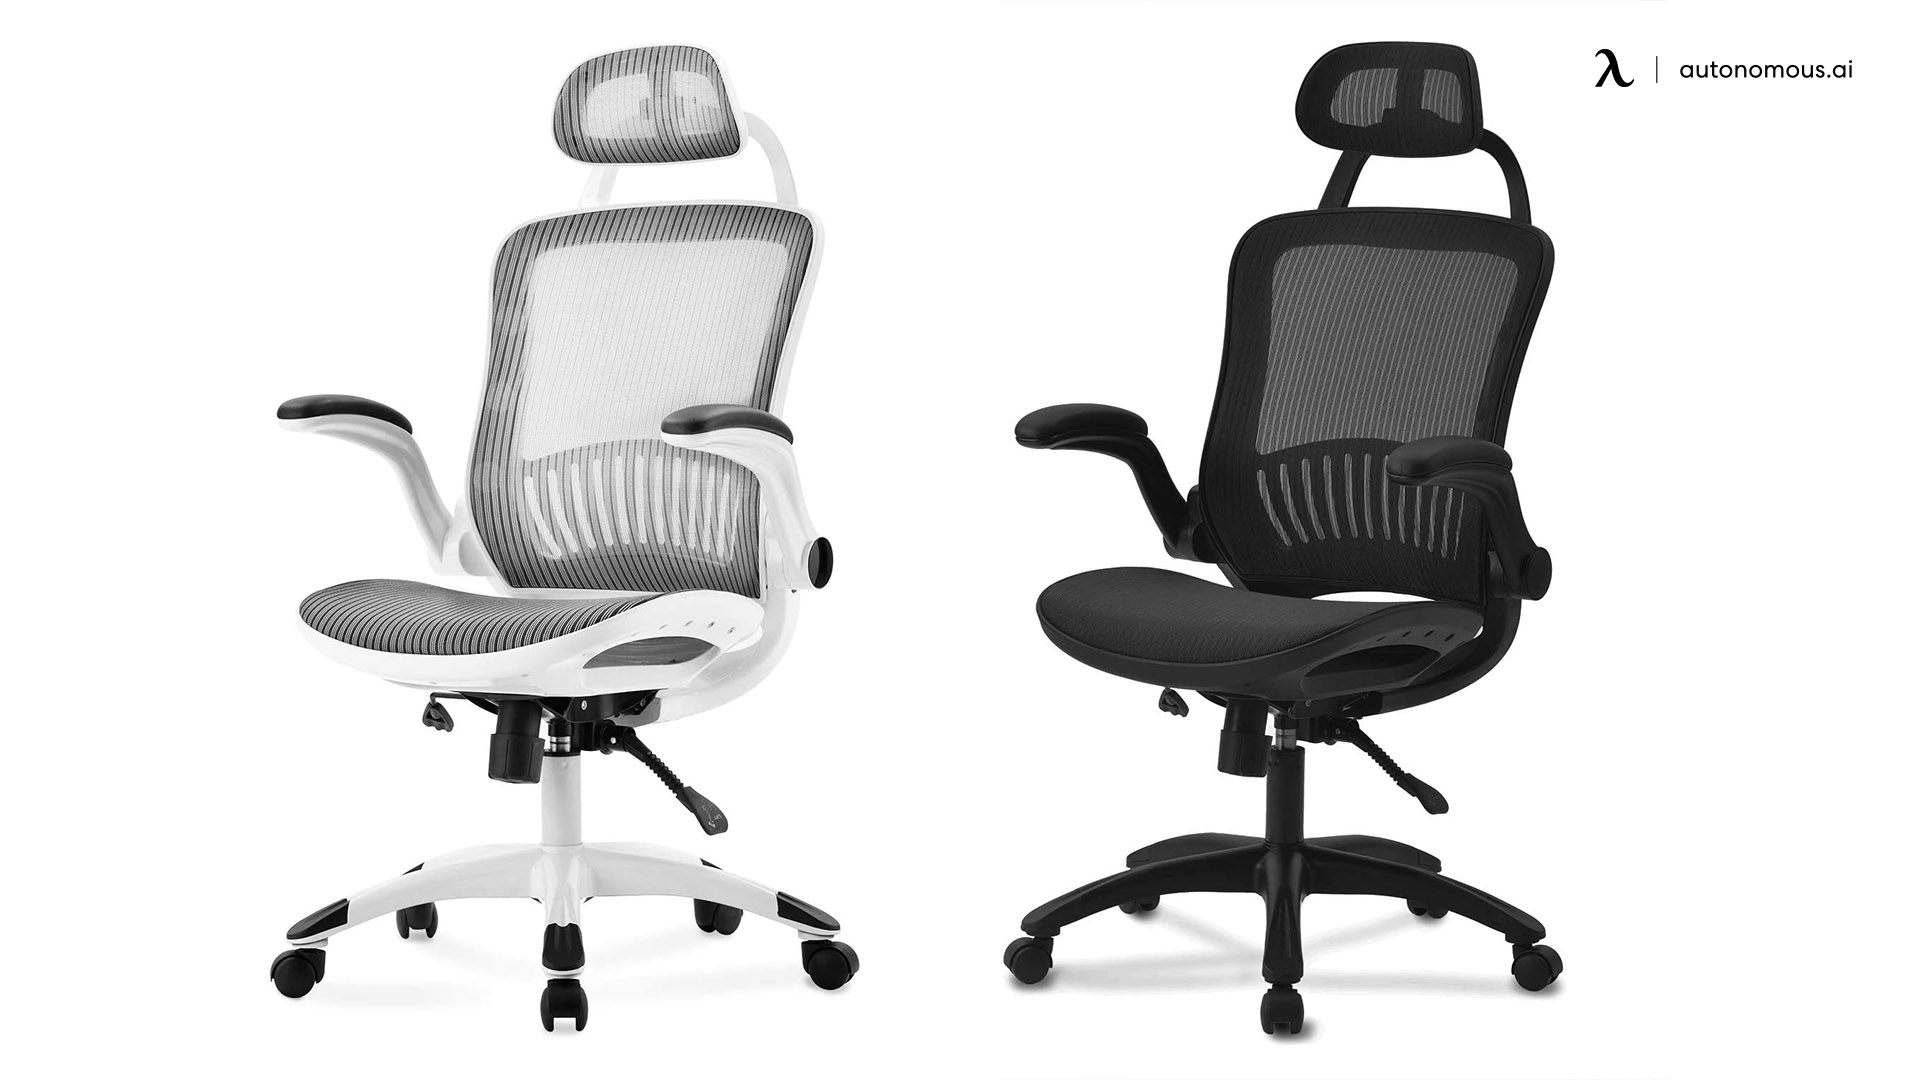 BTM Mesh Computer Desk Chair